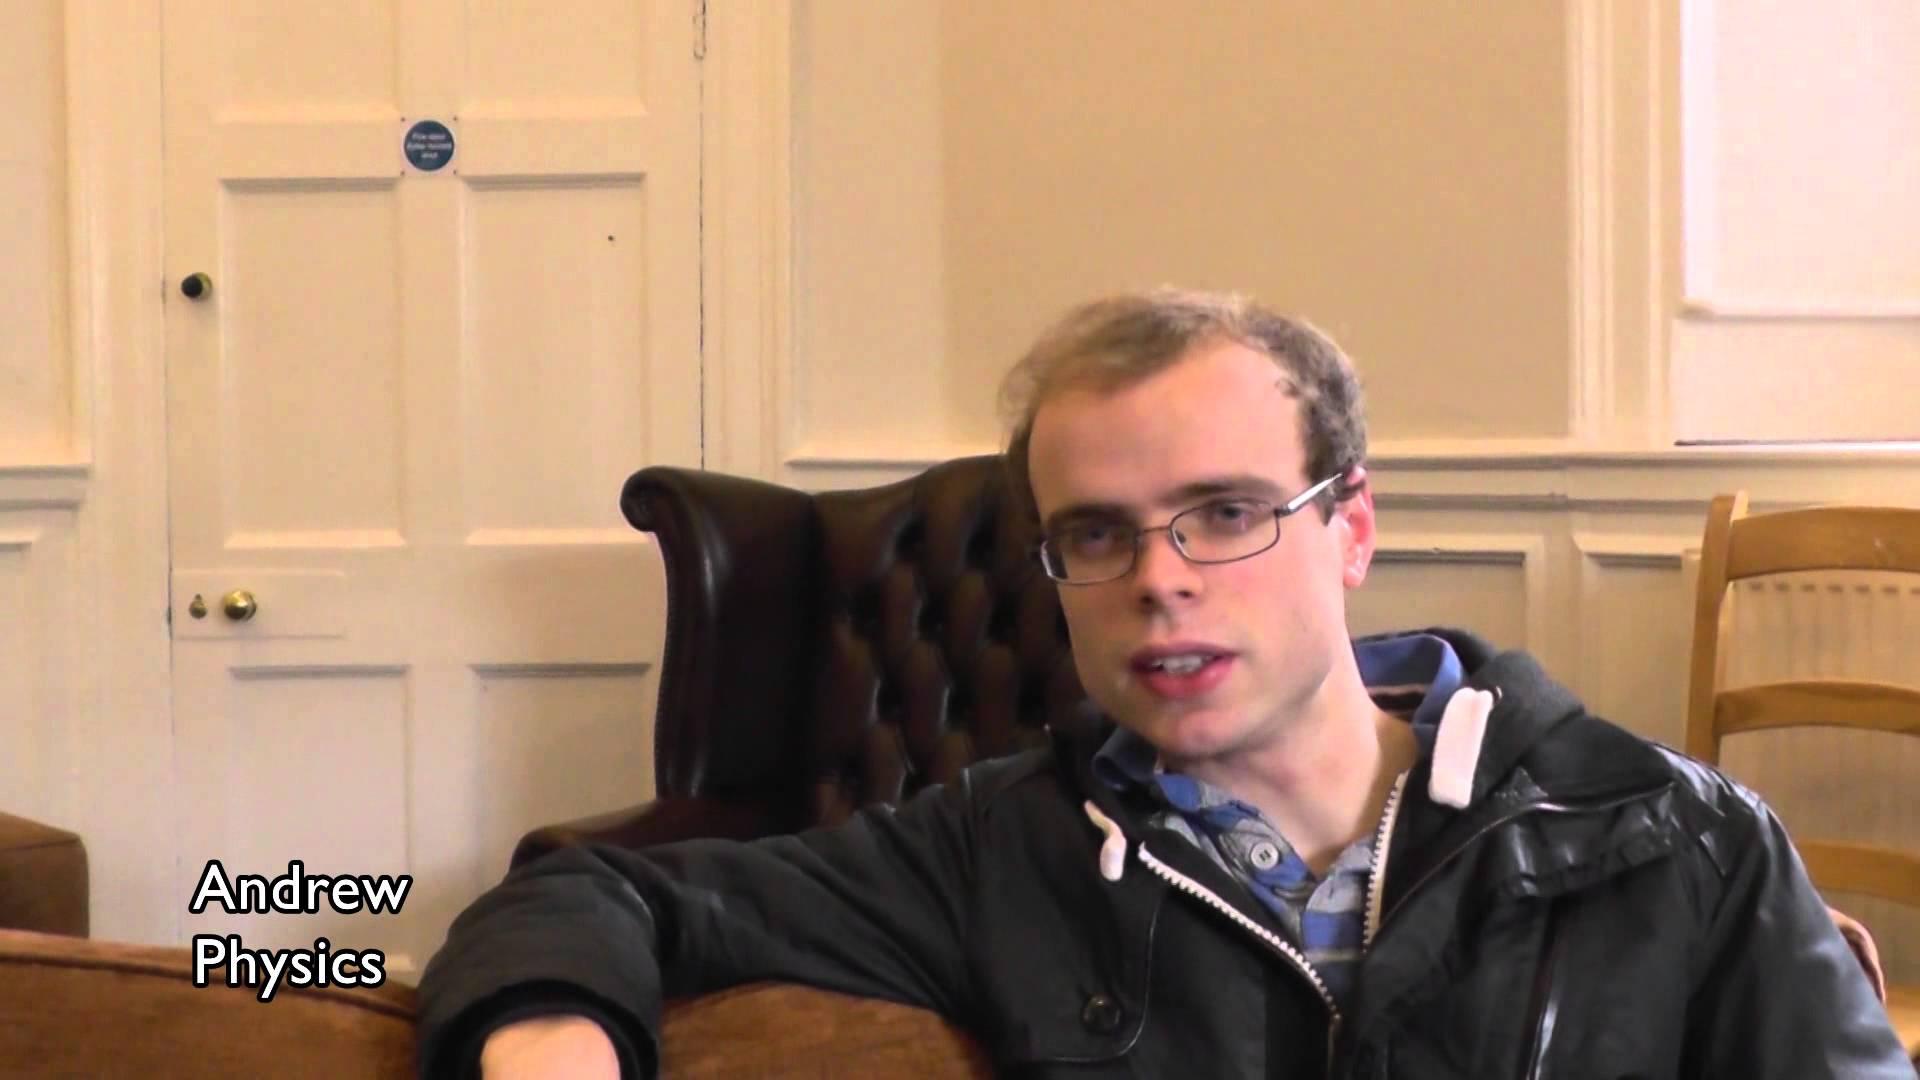 Christ Church Undergraduate Ambassadors: Andrew - Physics